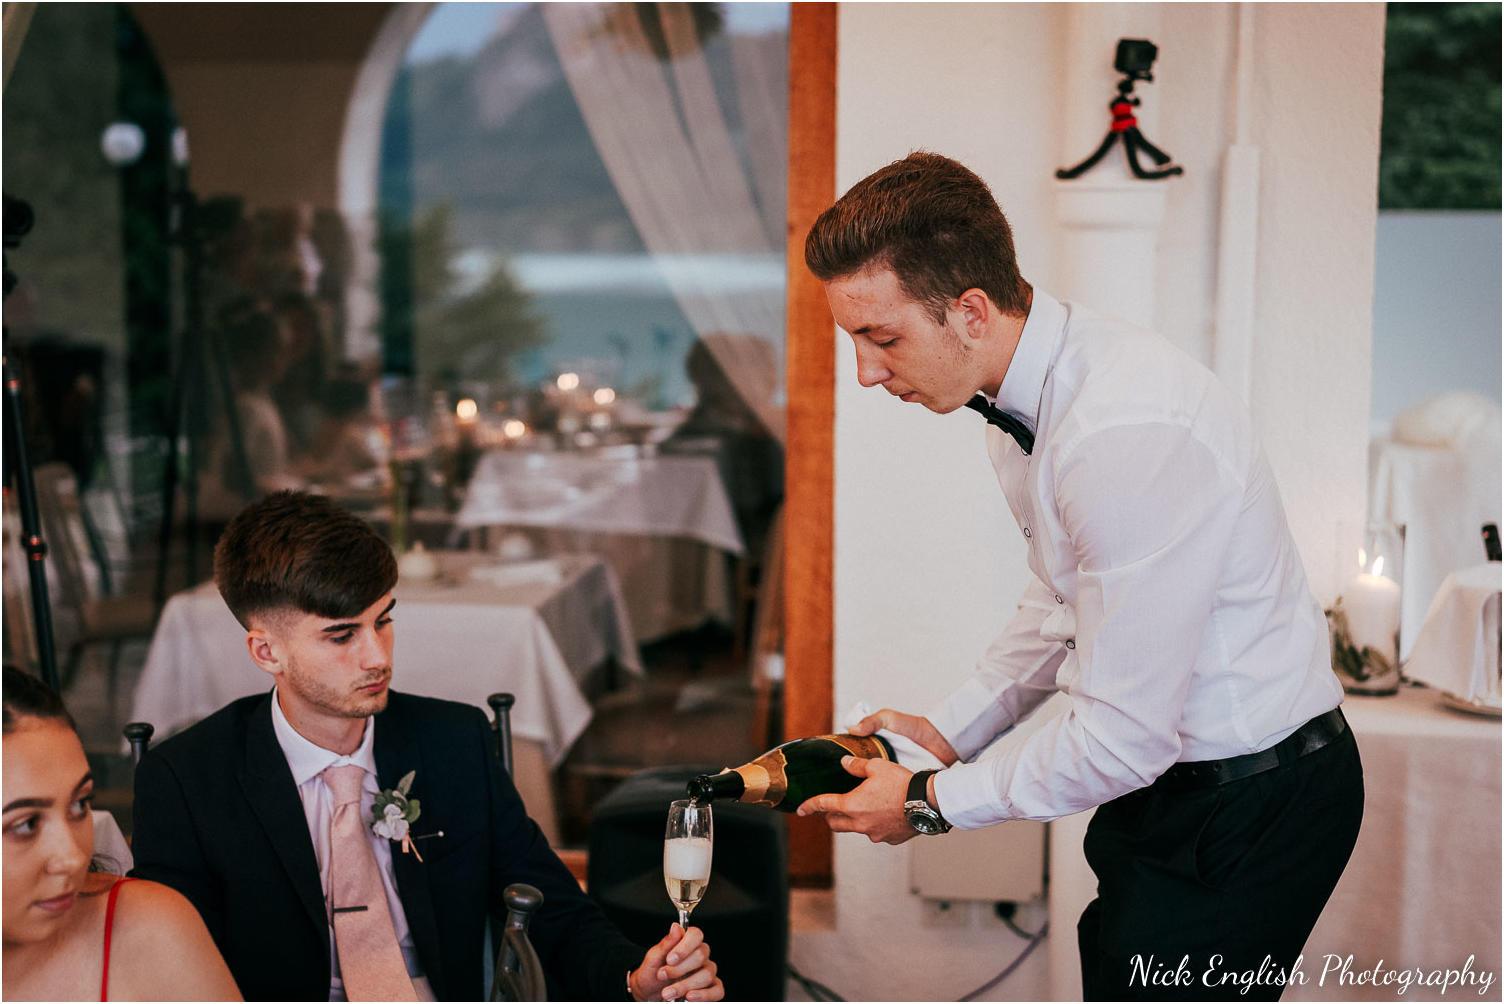 Destination_Wedding_Photographer_Slovenia_Nick_English_Photography-88.jpg